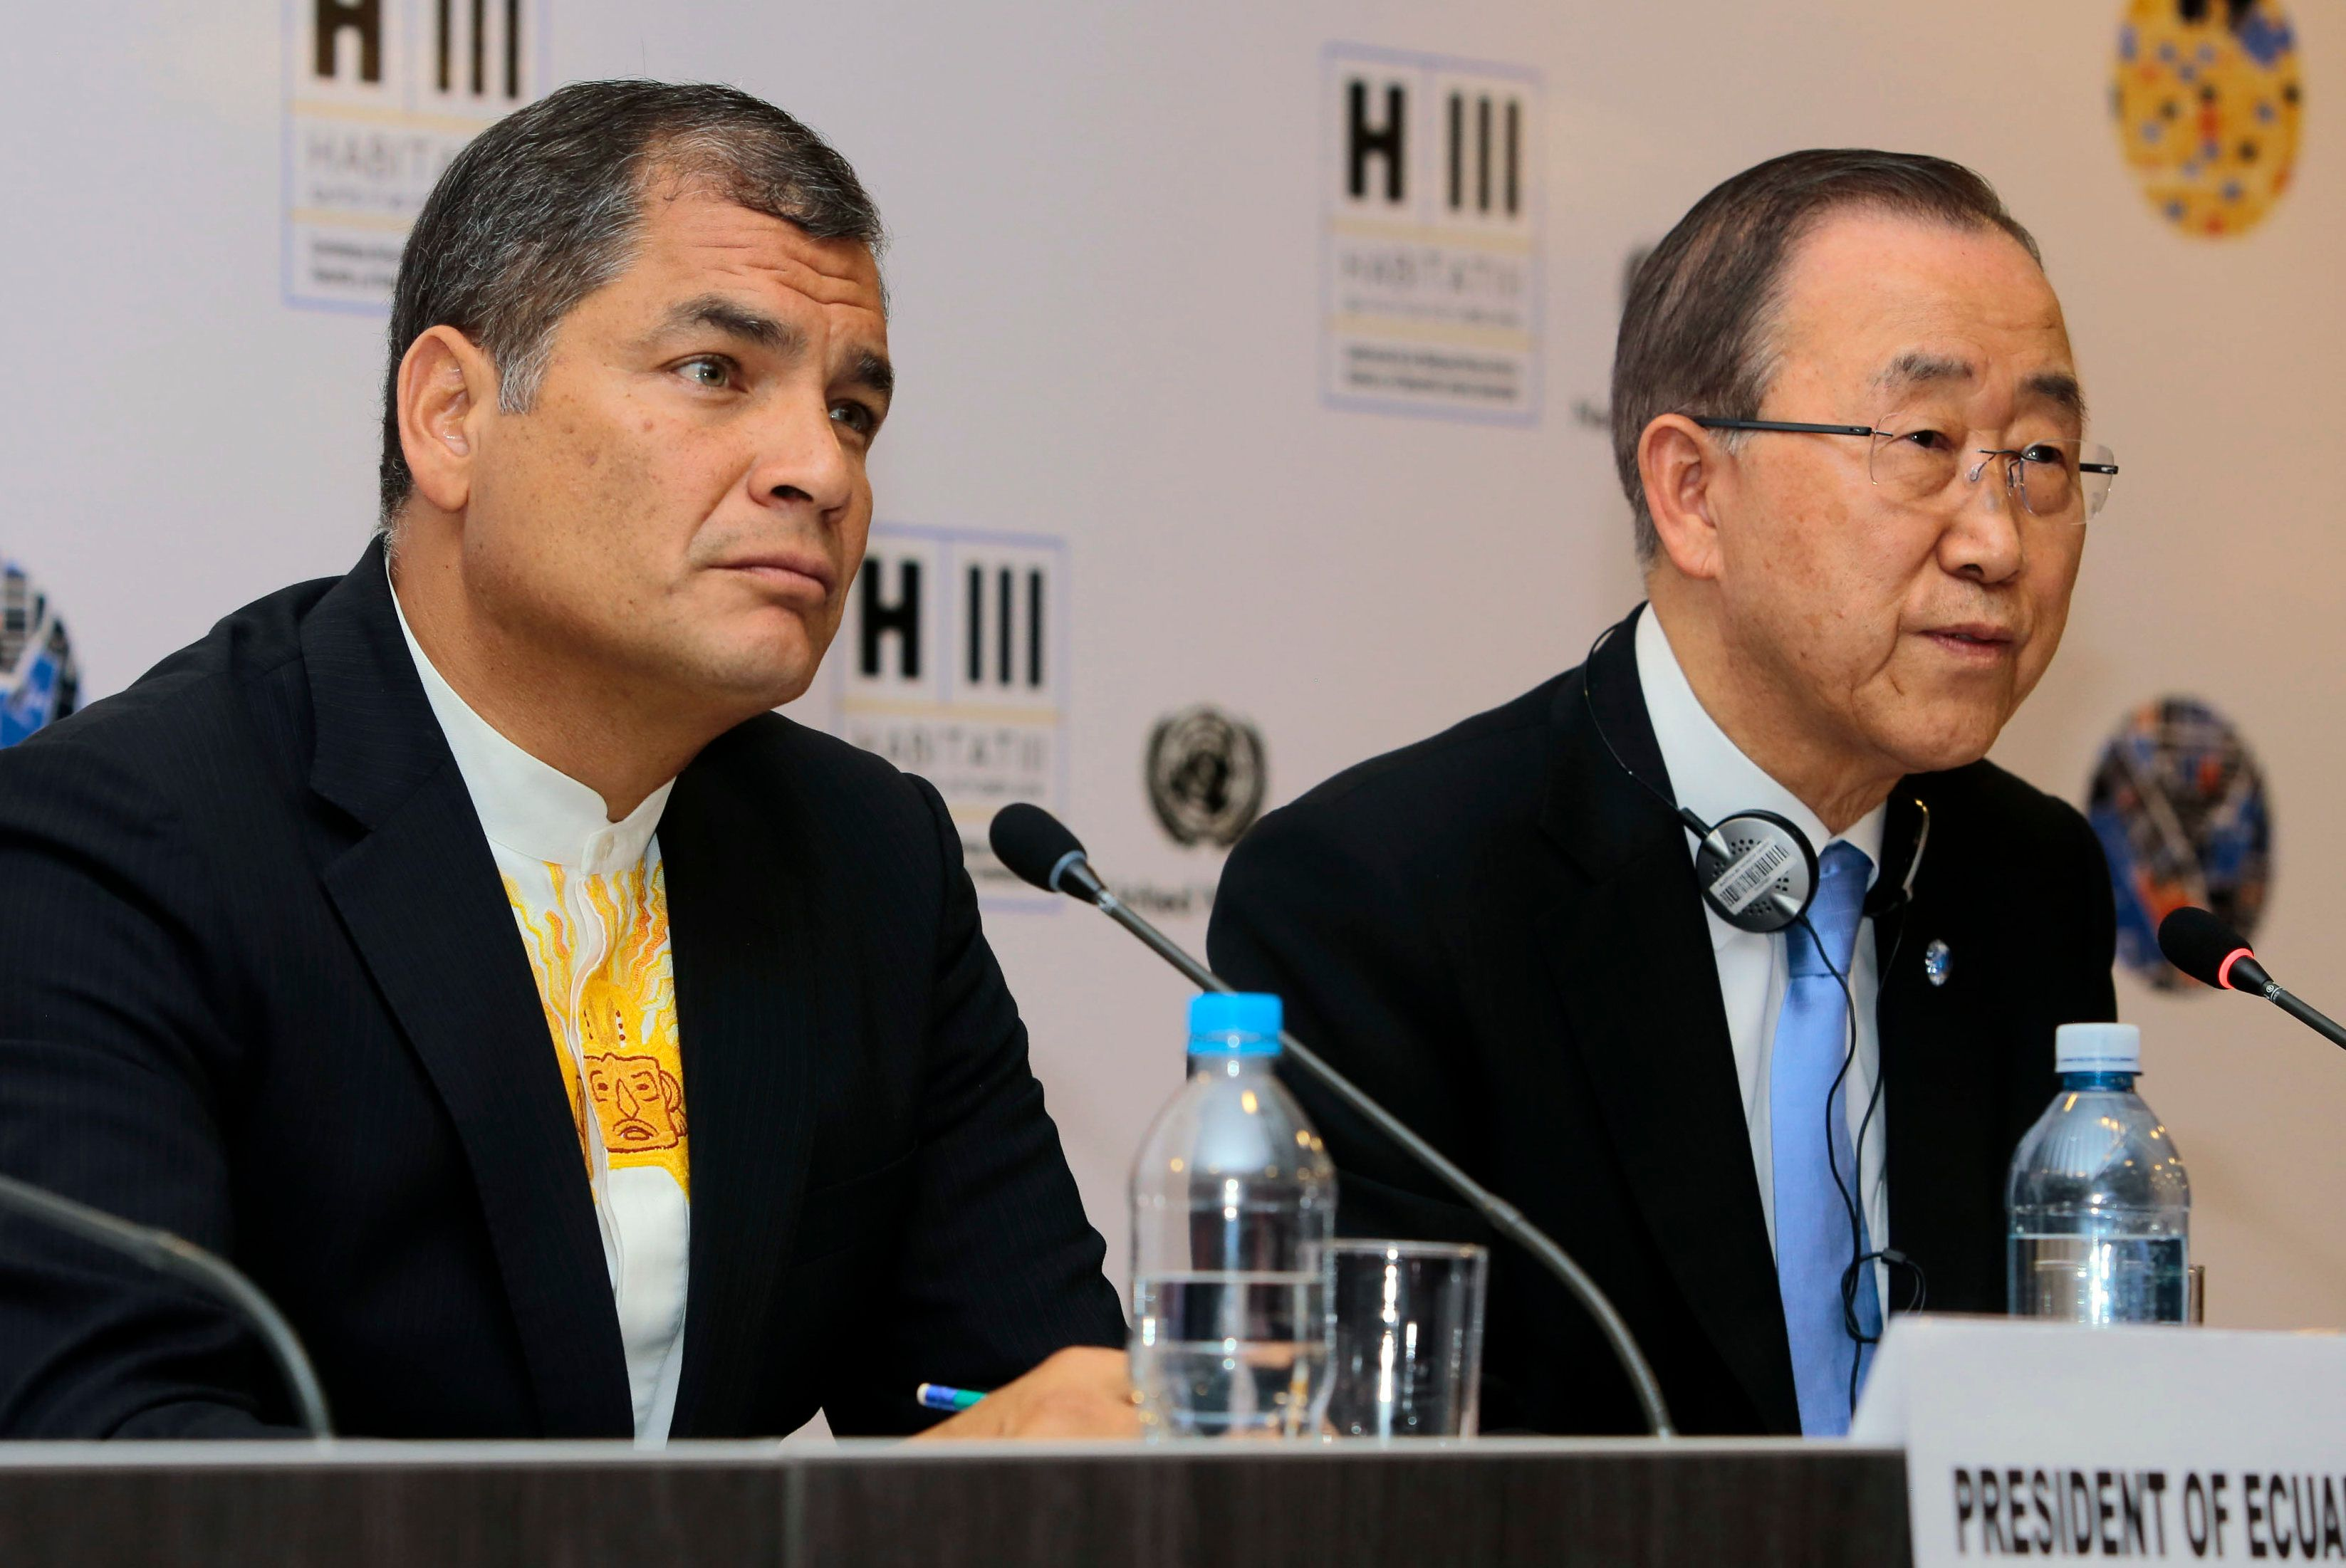 Ecuador's President Rafael Correa (left) and U.N. Secretary-General Ban Ki-moon hold a press conference in October2016.